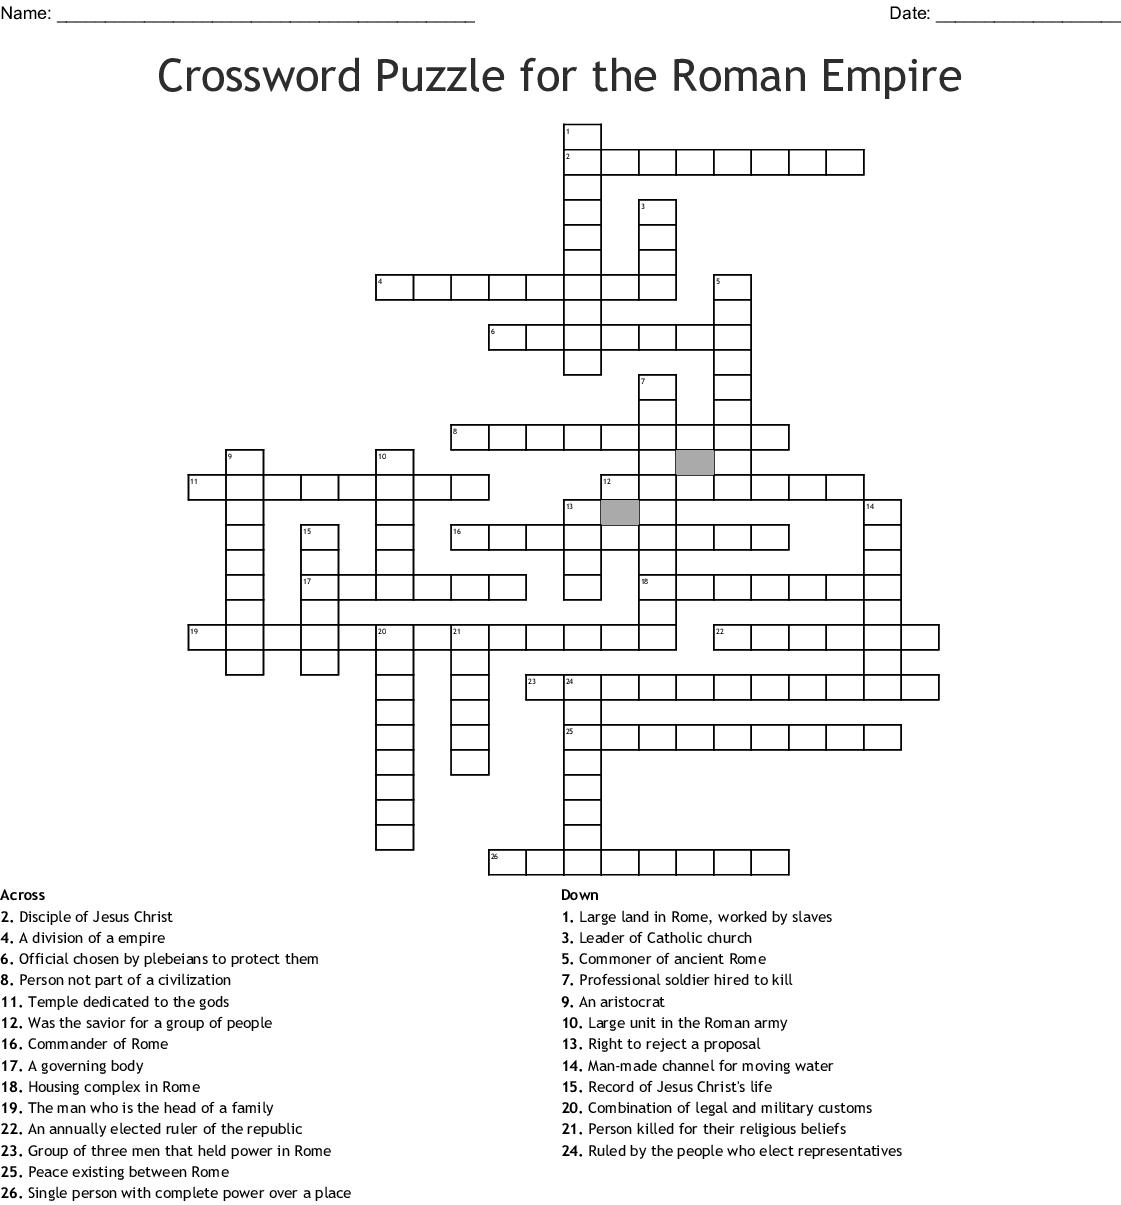 Crossword Puzzle for the Roman Empire - WordMint